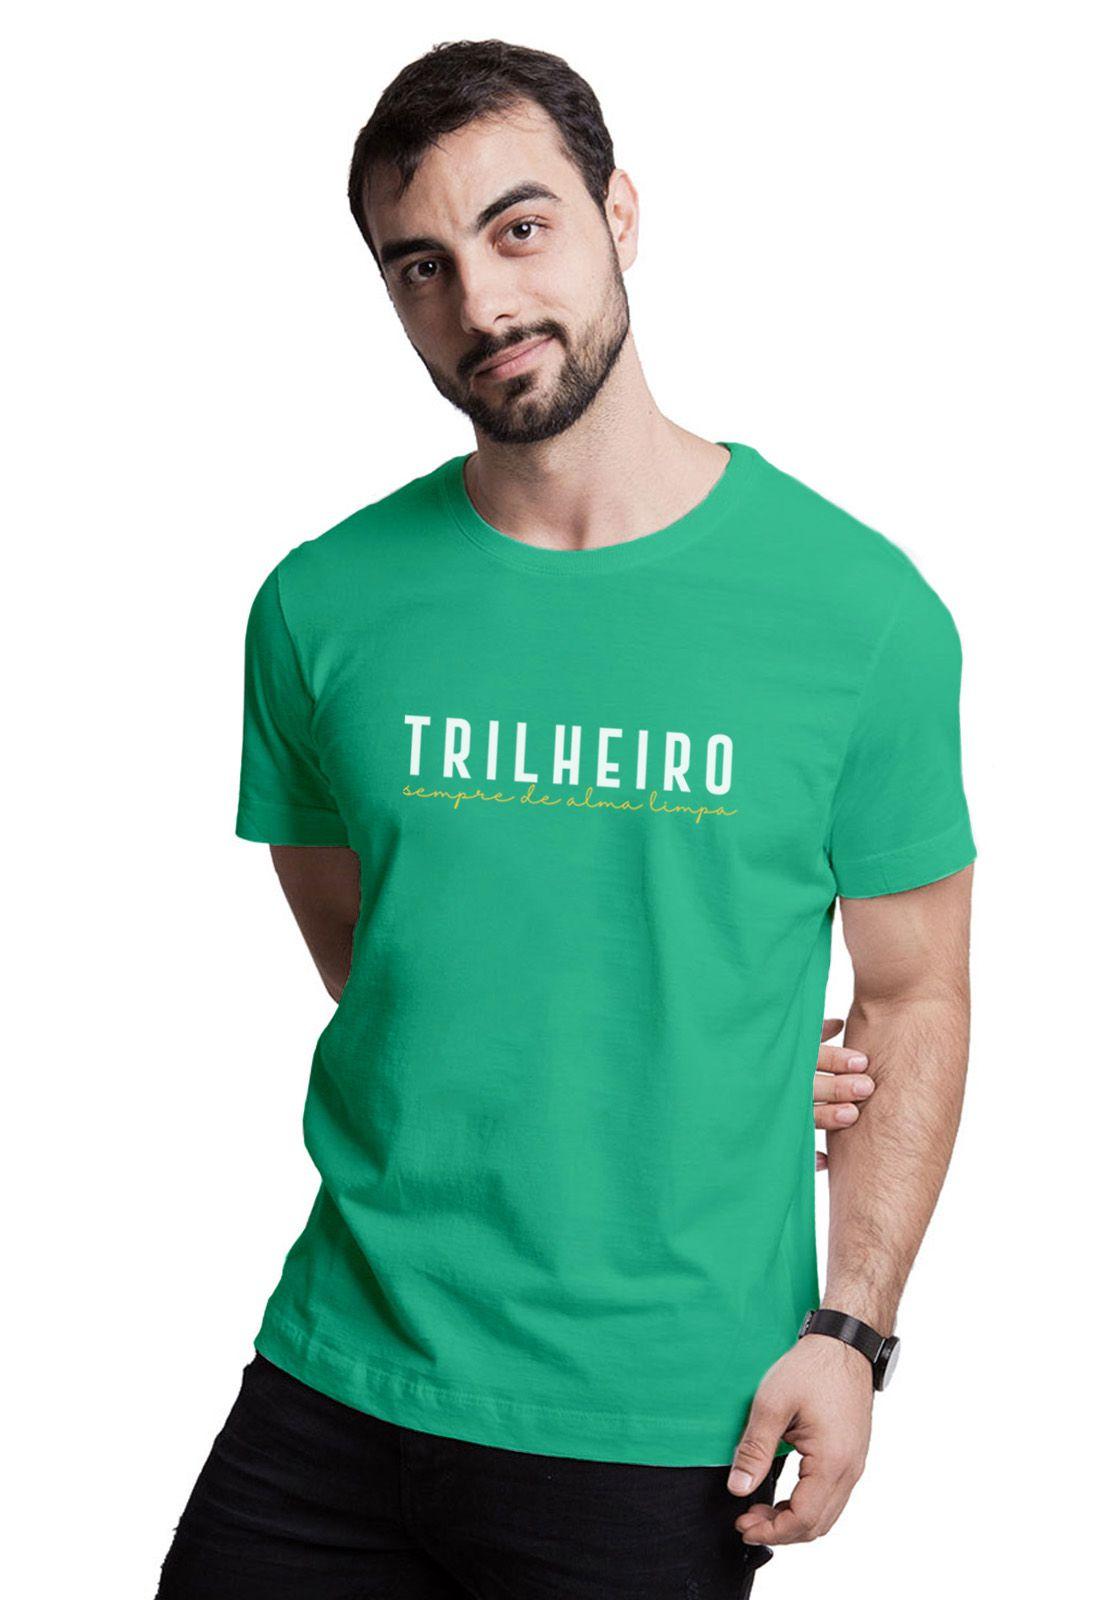 Camiseta Trilheiro Verde